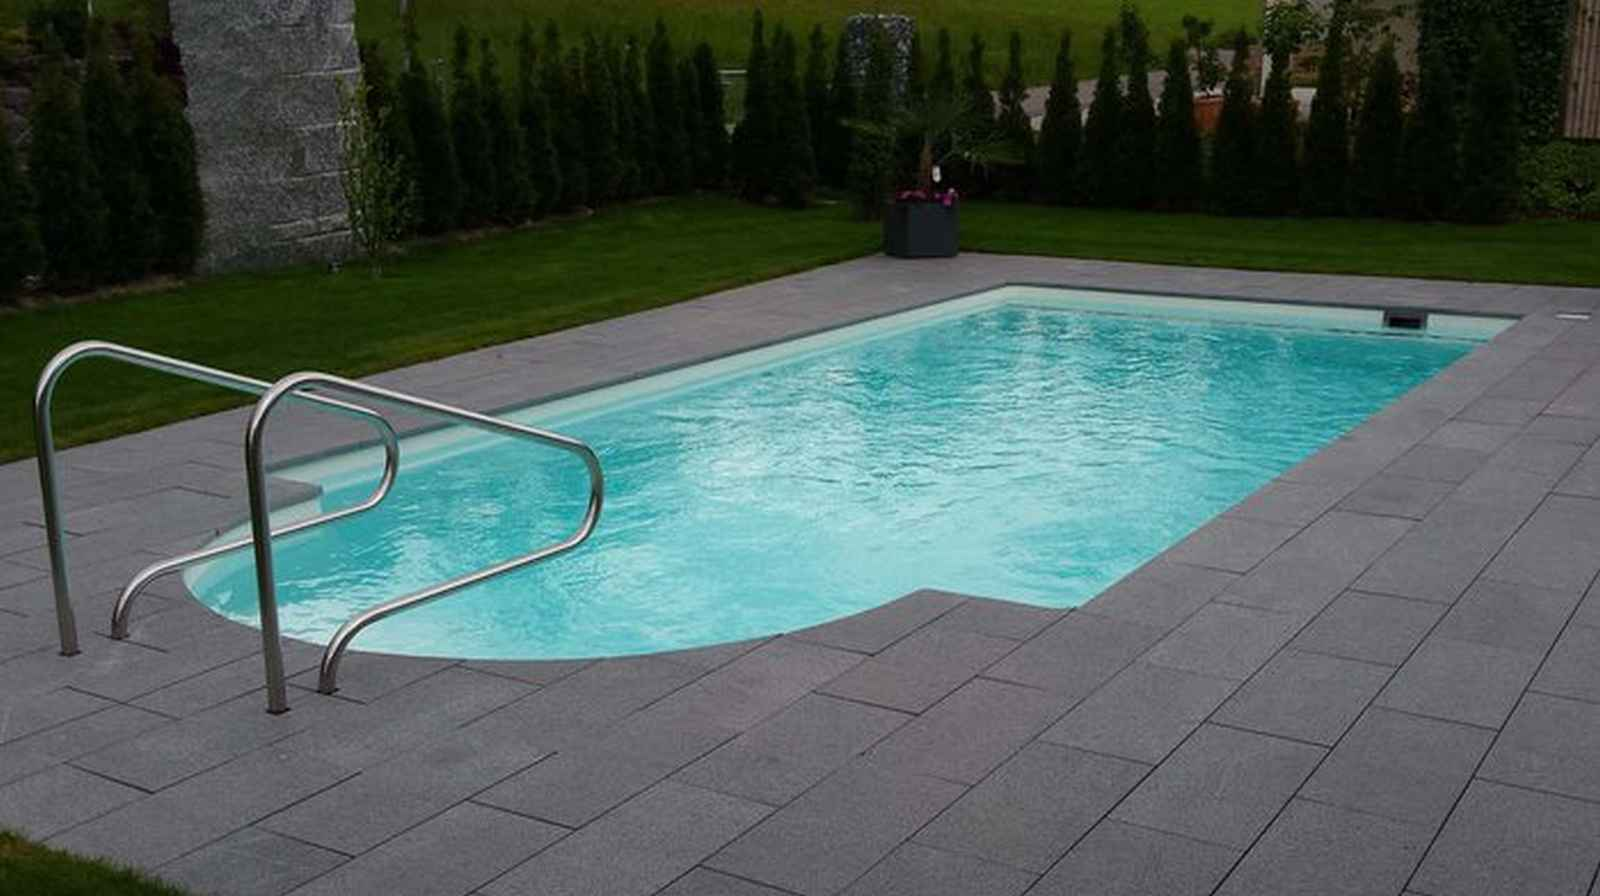 modell elba 62 schwimmbadtechnik frankfurt. Black Bedroom Furniture Sets. Home Design Ideas